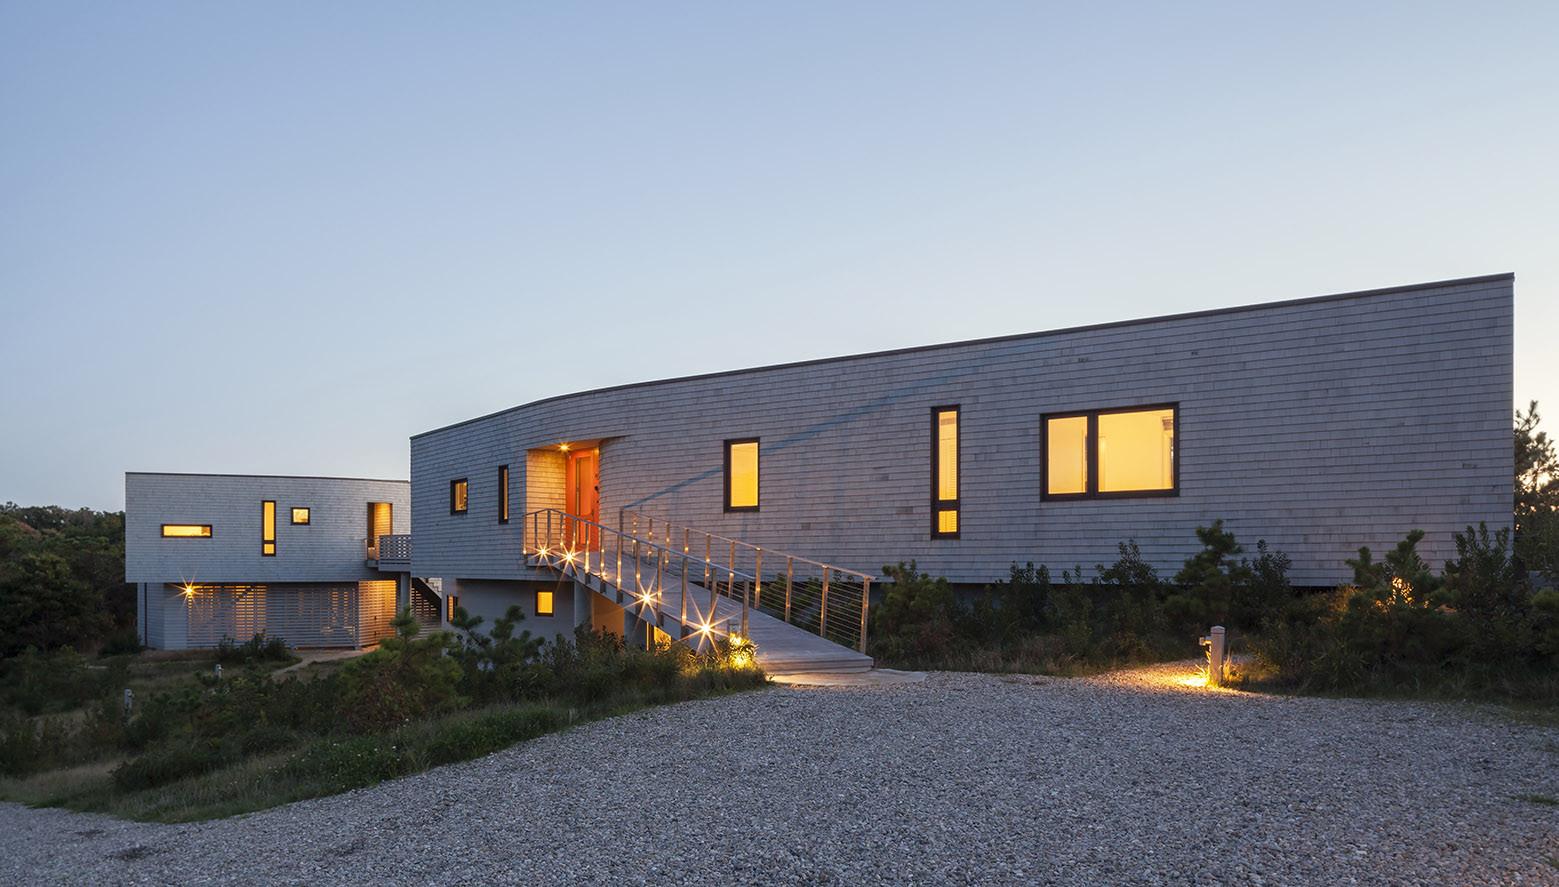 Casa en las dunas / Ruhl Walker Architects, © Jane Messinger